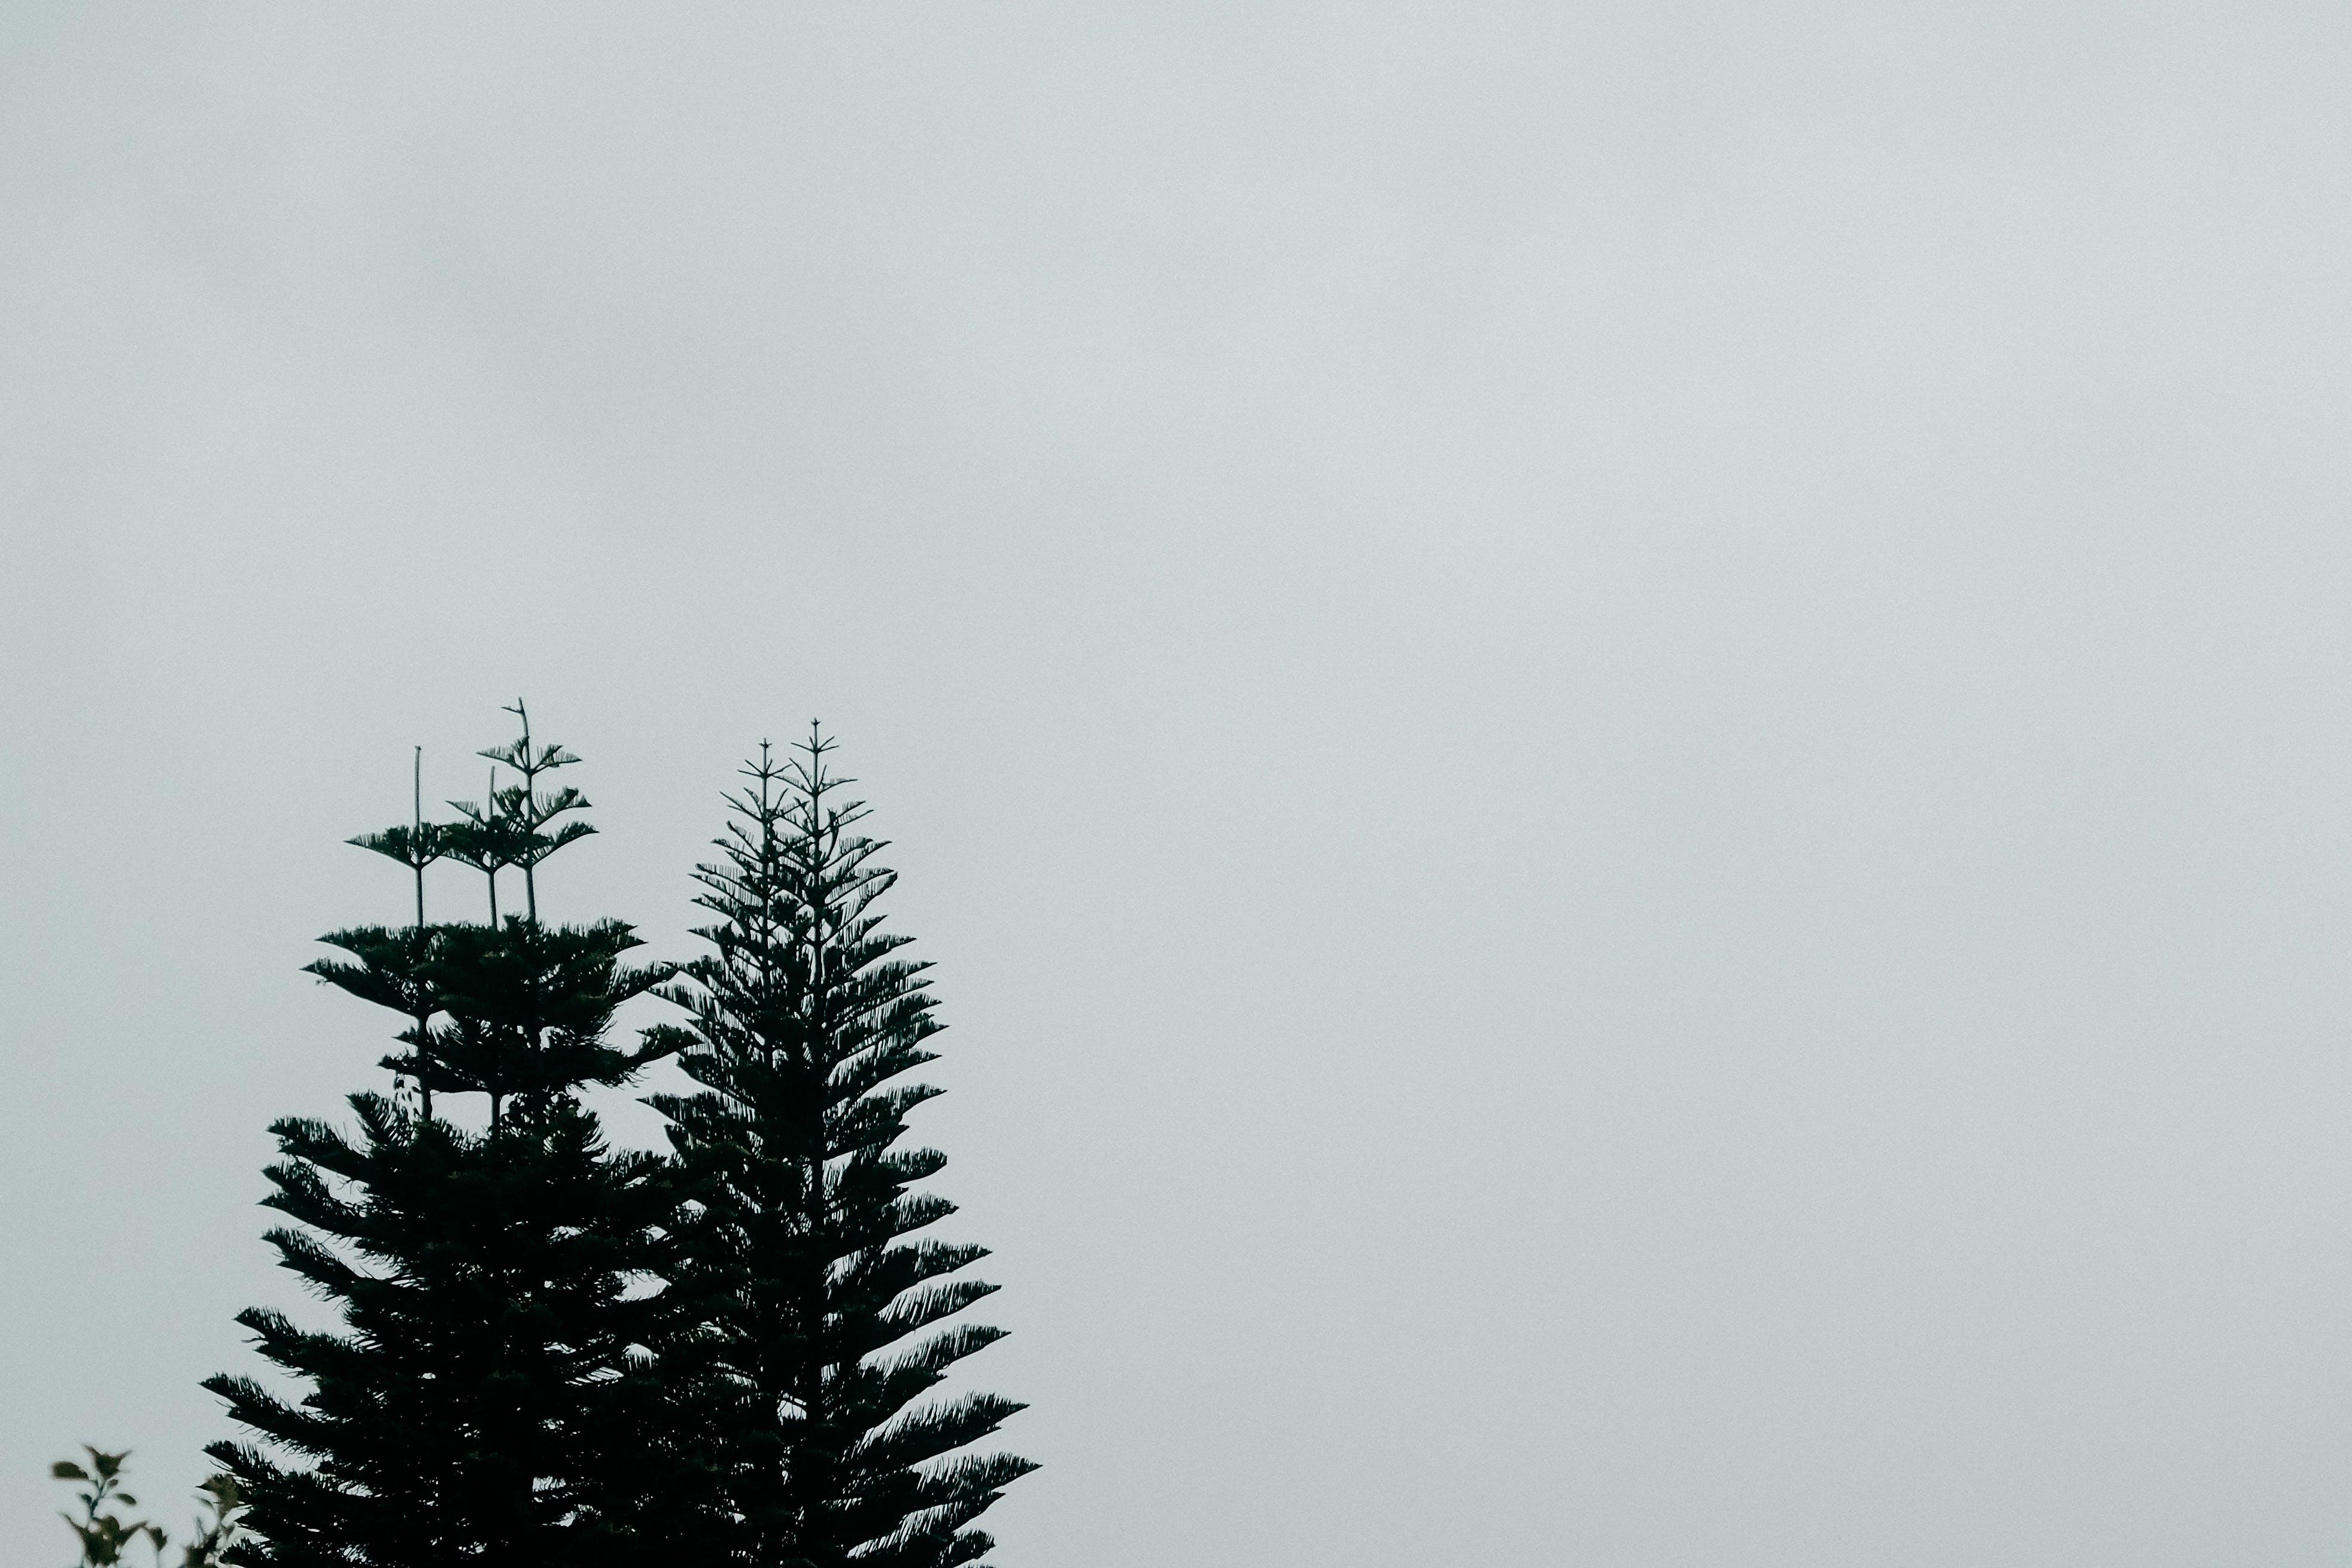 Pine Tree Under White Sky